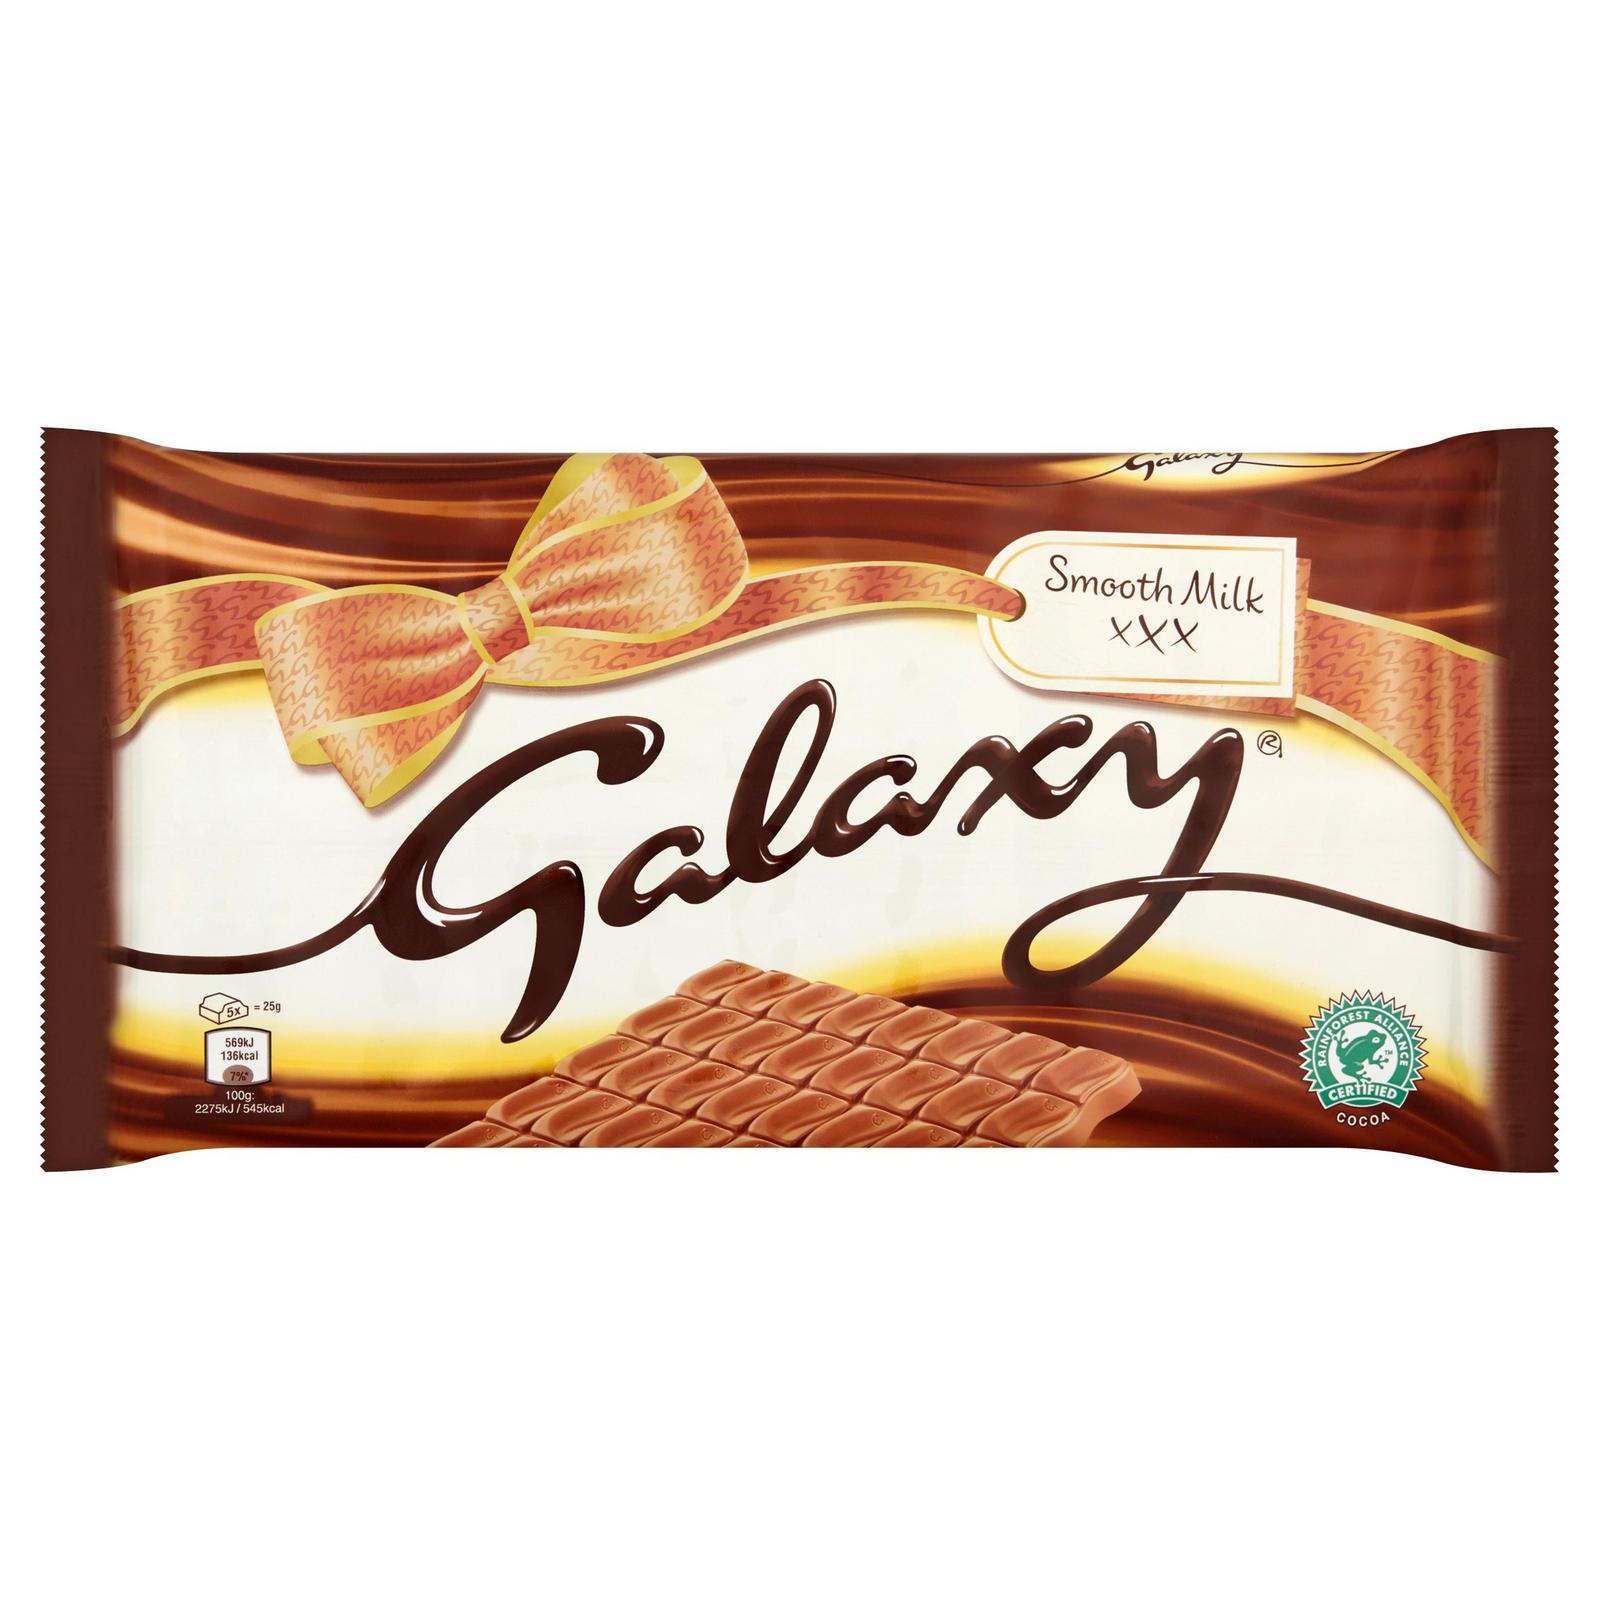 Galaxy Smooth Milk Chocolate Large Gifting Block 360g £2 @ B&M (Telford)